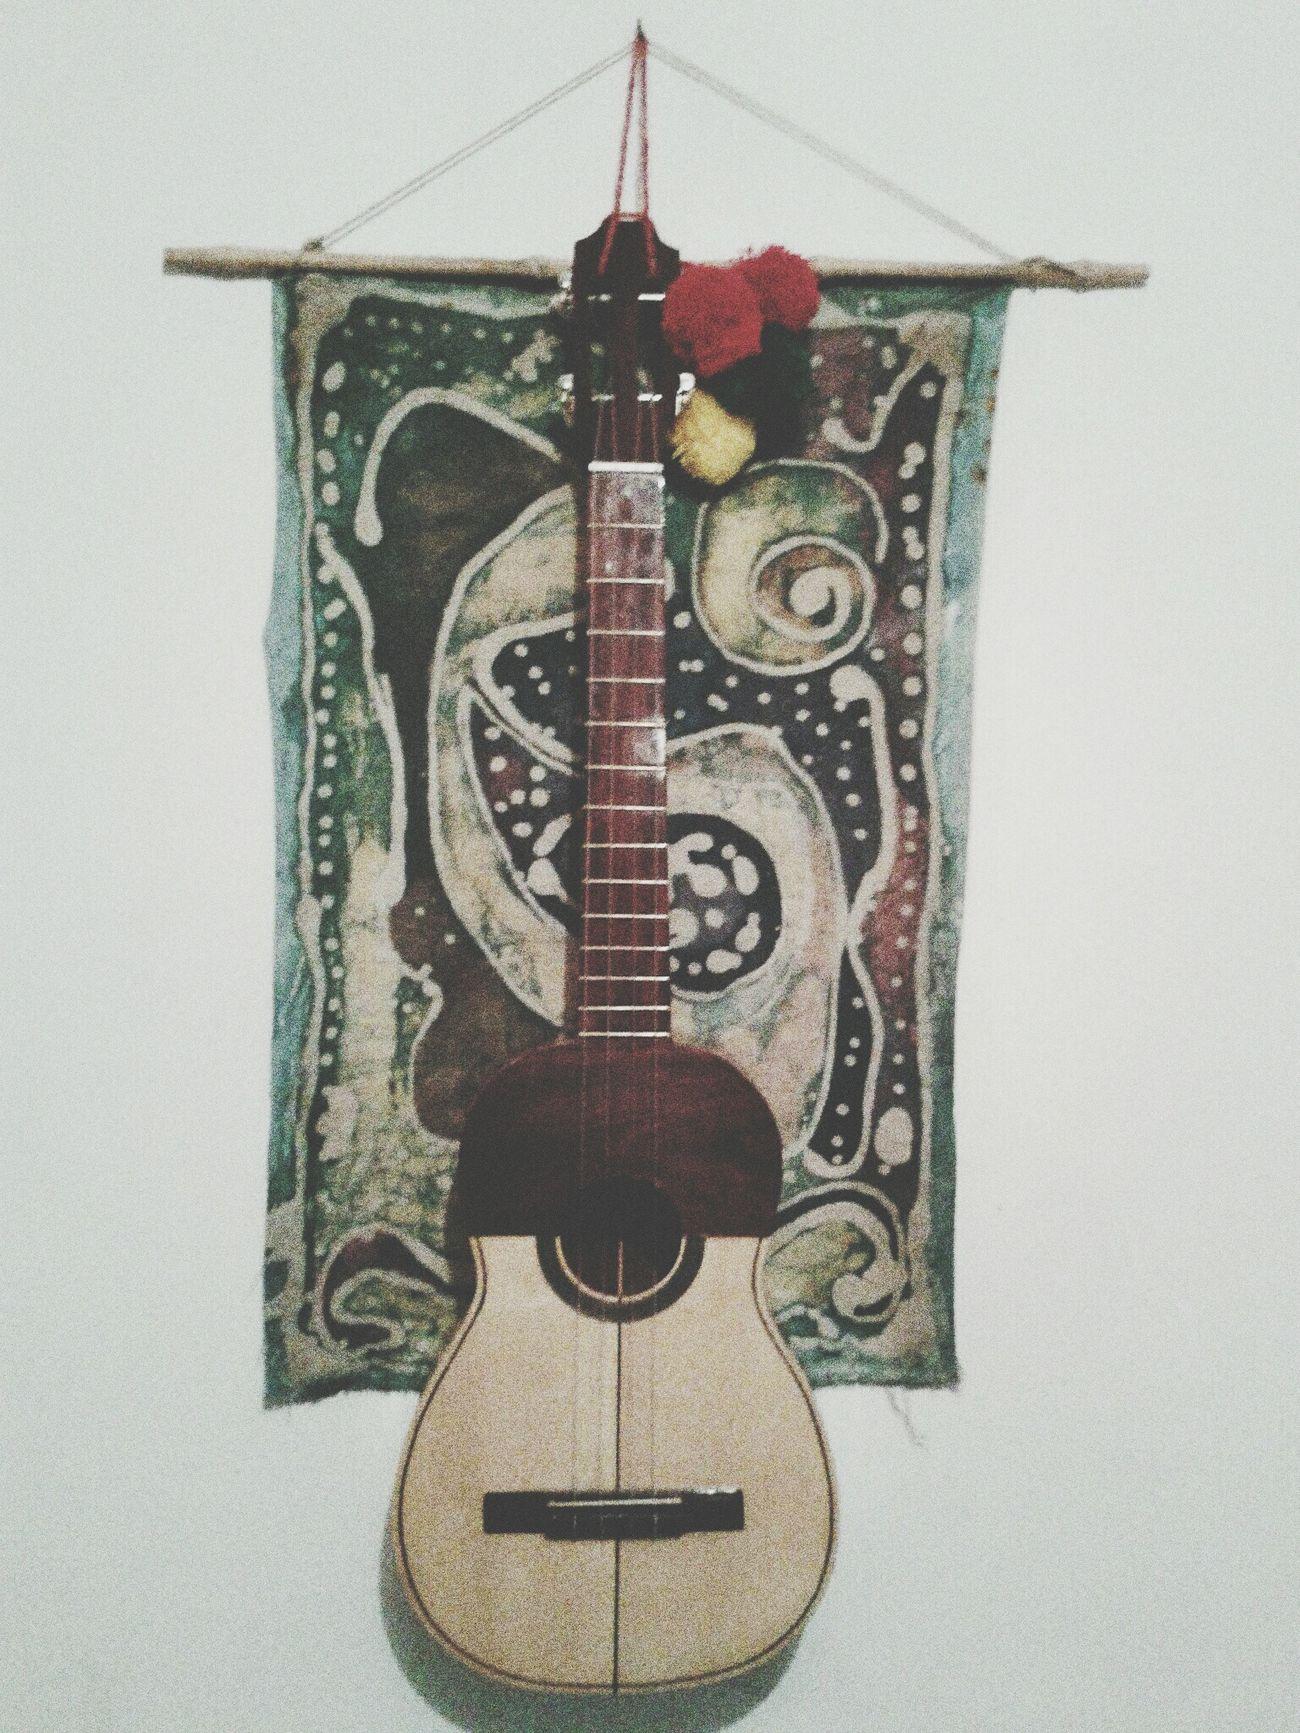 Cuatro Instrument Music Artesania Latinoamerica Raíces Família